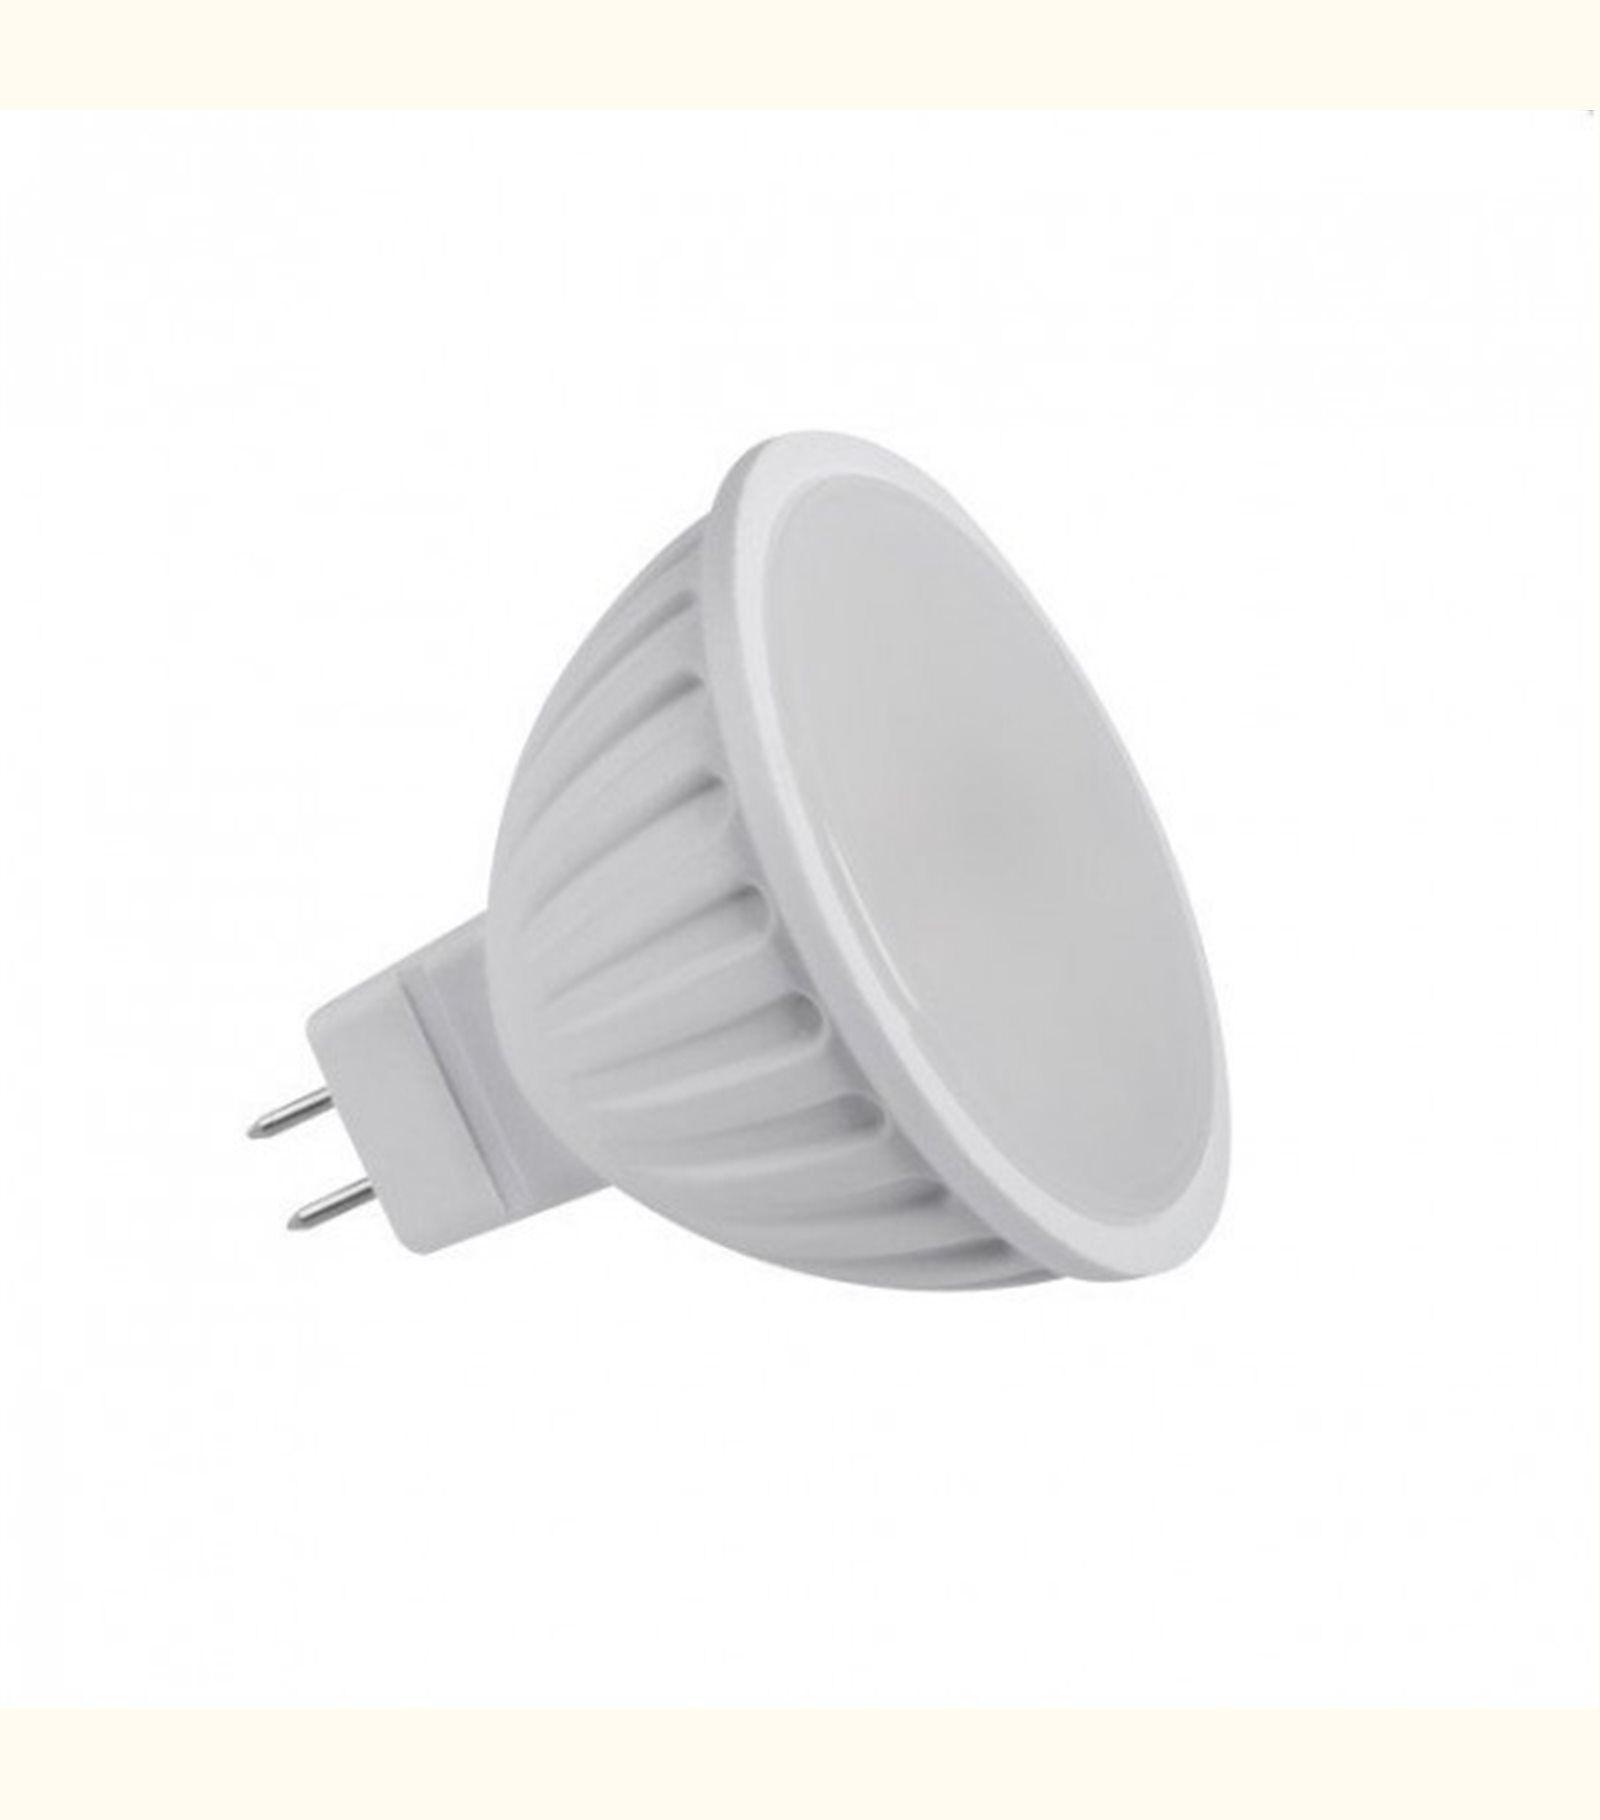 Kanlux Spot LED GU5.3 7 watt (eq. 40 watt) - Couleur - Blanc chaud 3000°K